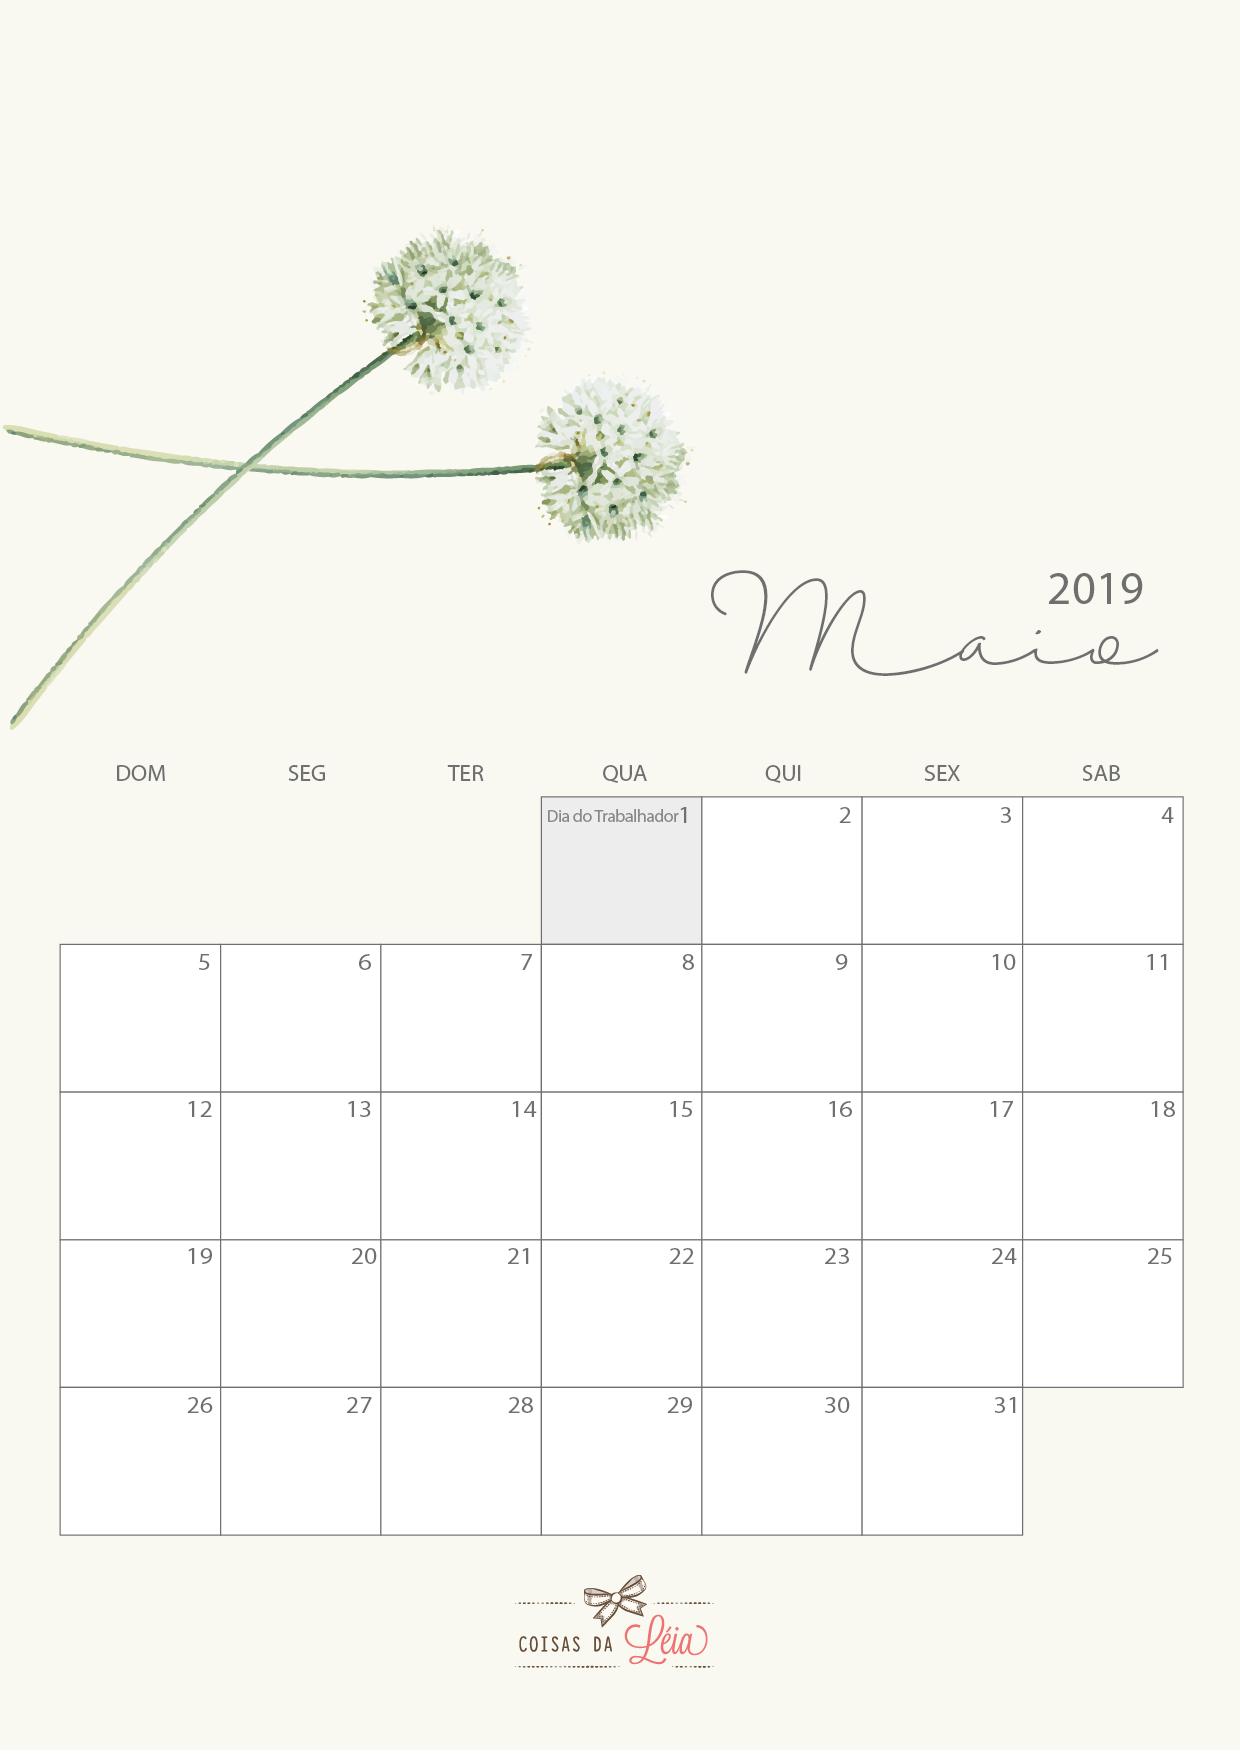 Calendario 2019 Gratuito Para Download Coisas Da Leia